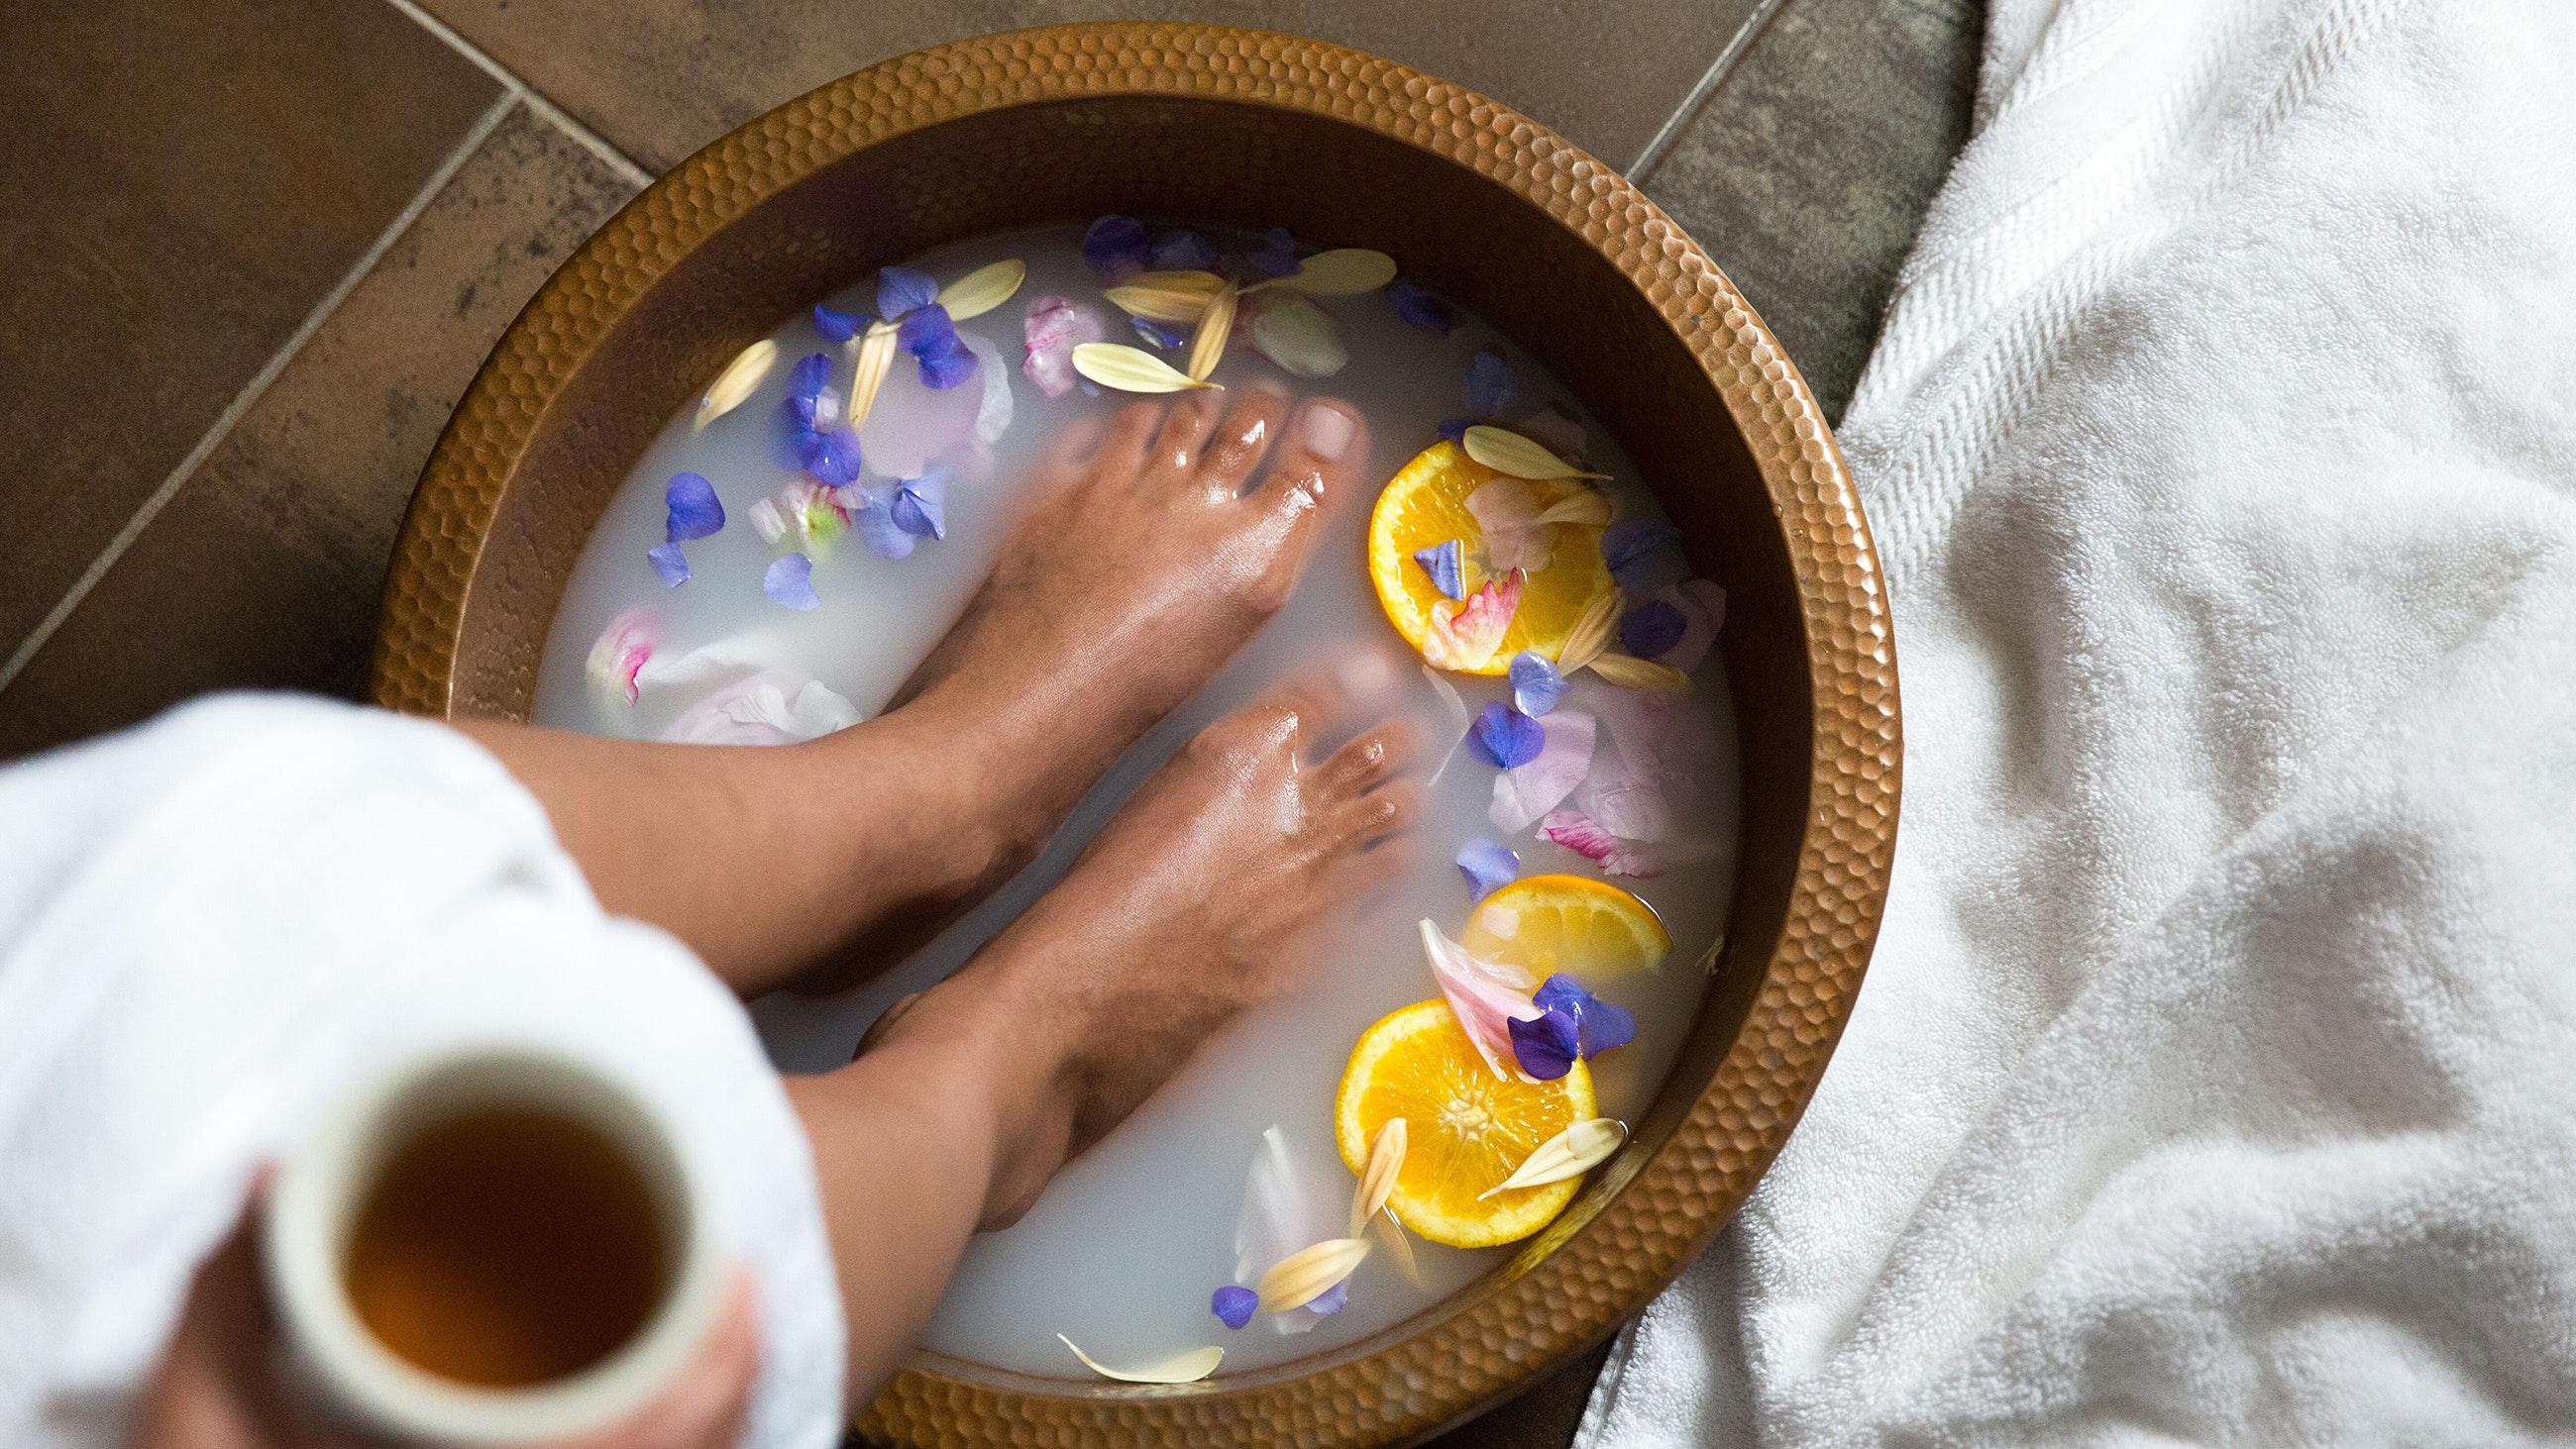 Woman soaking feet in dallas spa